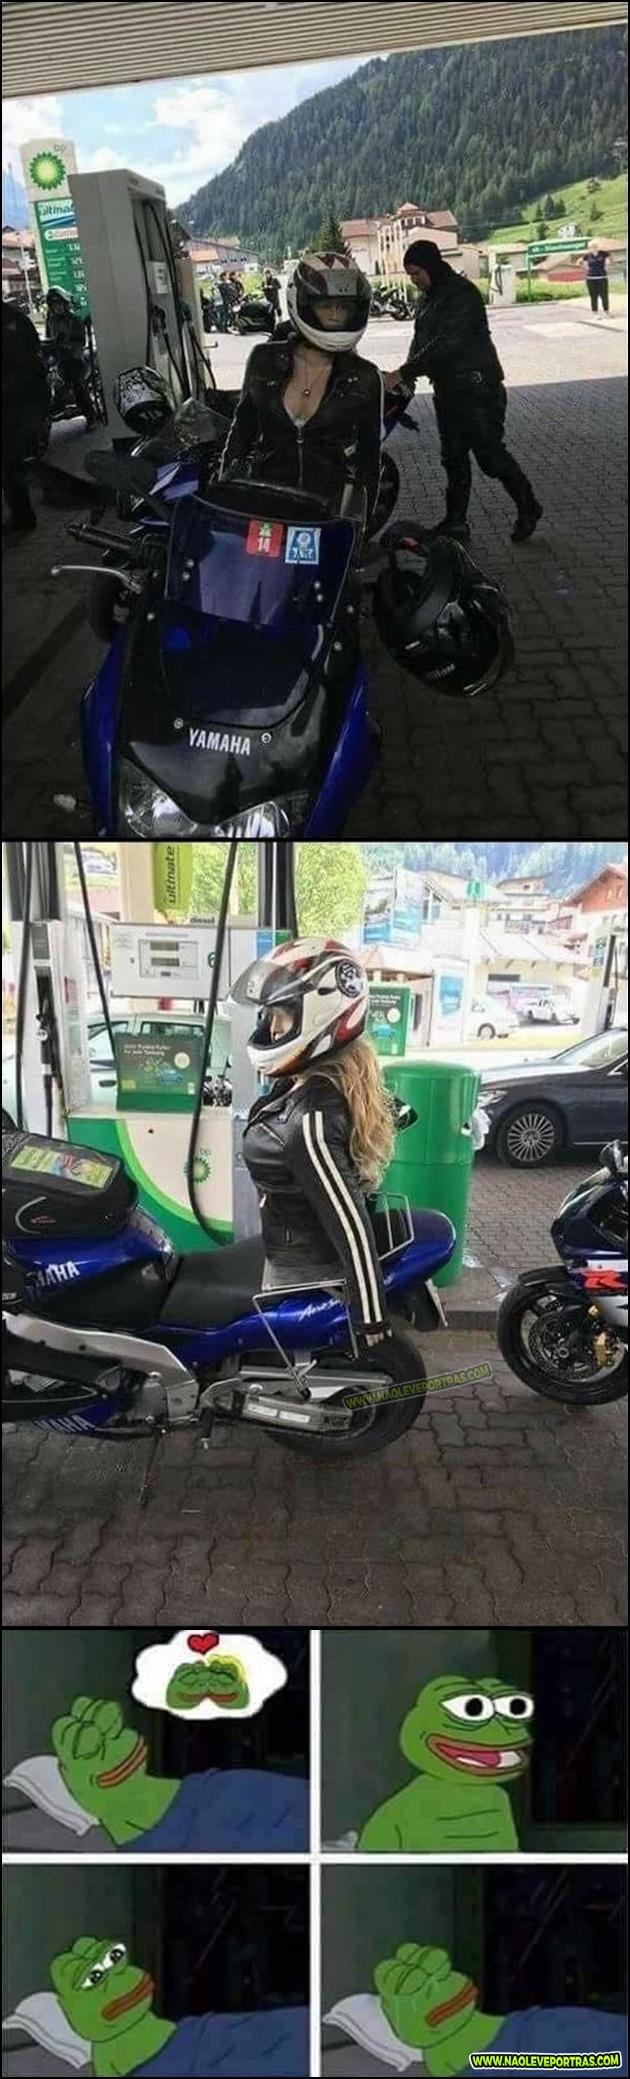 forever alone de moto